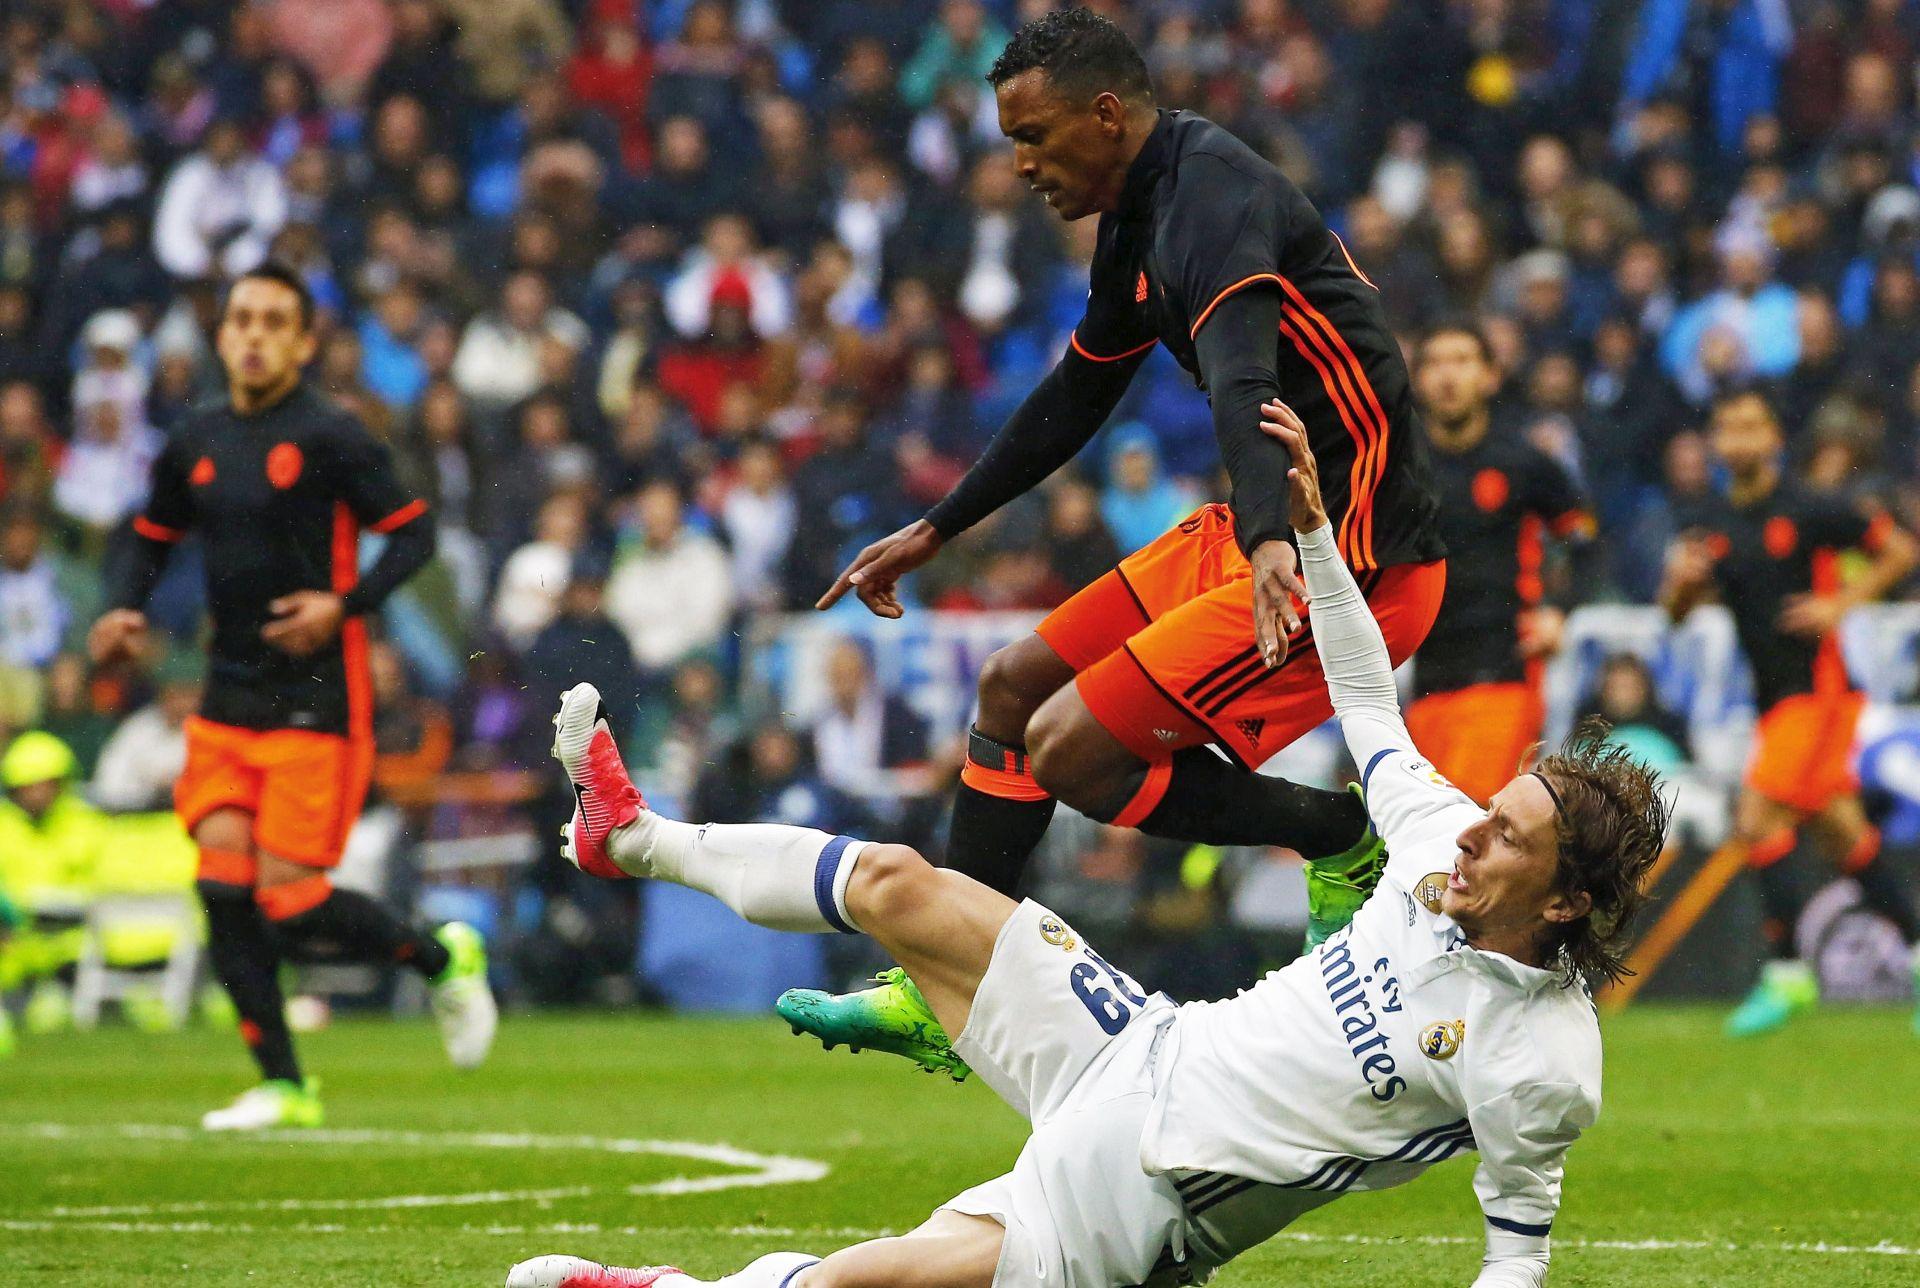 ŠPANJOLSKA Marcelo spasio Real i Ronalda, Granada ispala